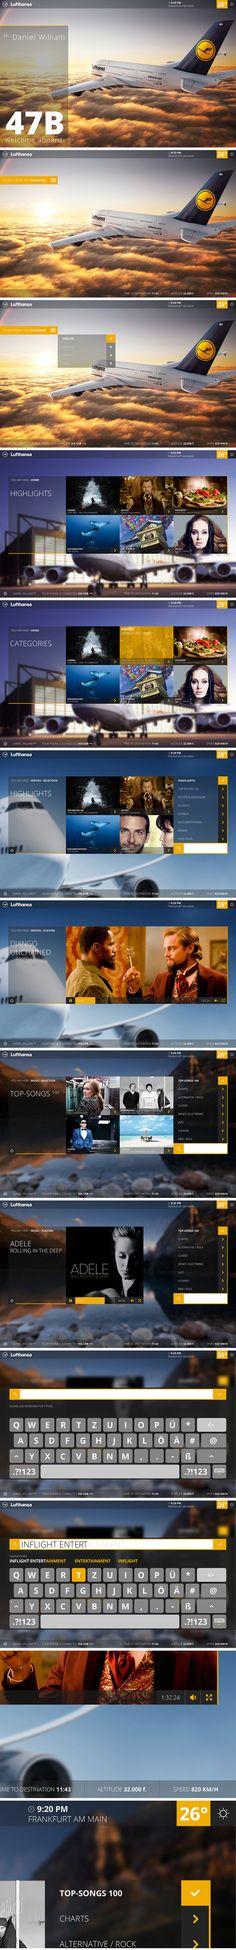 Lufthansa Inflight Entertainment System. #ui #ux #webdesign #lufthansa #app #graphic in Inspiration